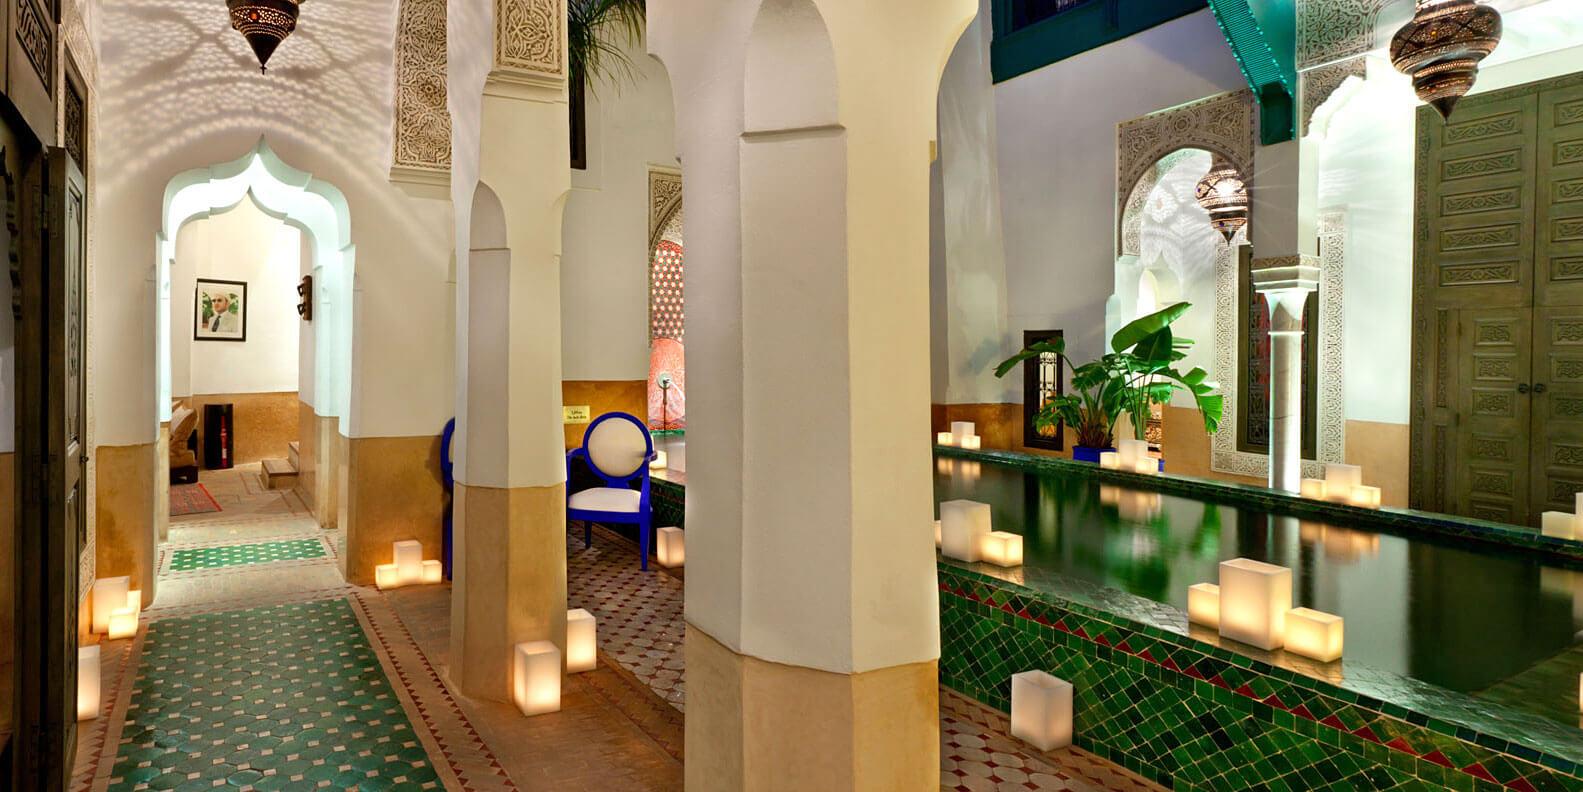 Le Farnatchi, Marrakech, Morocco Hotel Reviews